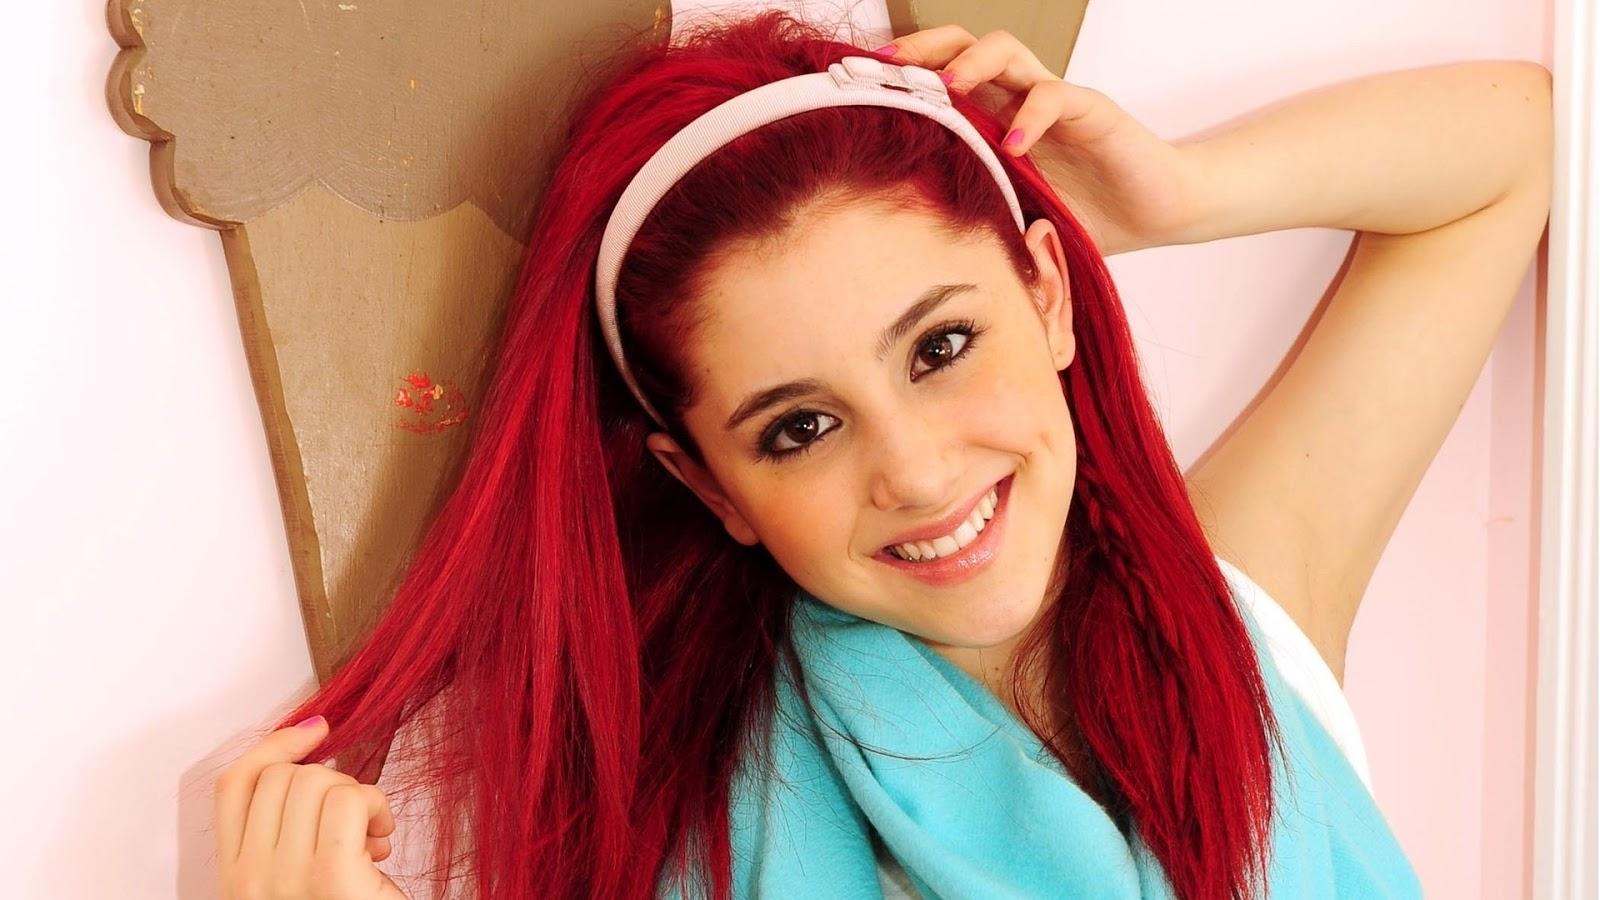 http://4.bp.blogspot.com/-euP9eCEU4eA/UPPh4YxhE3I/AAAAAAAACro/uqWSiWjQYfs/s1600/Ariana+Grande+hd+Wallpapers+2013_4.jpg